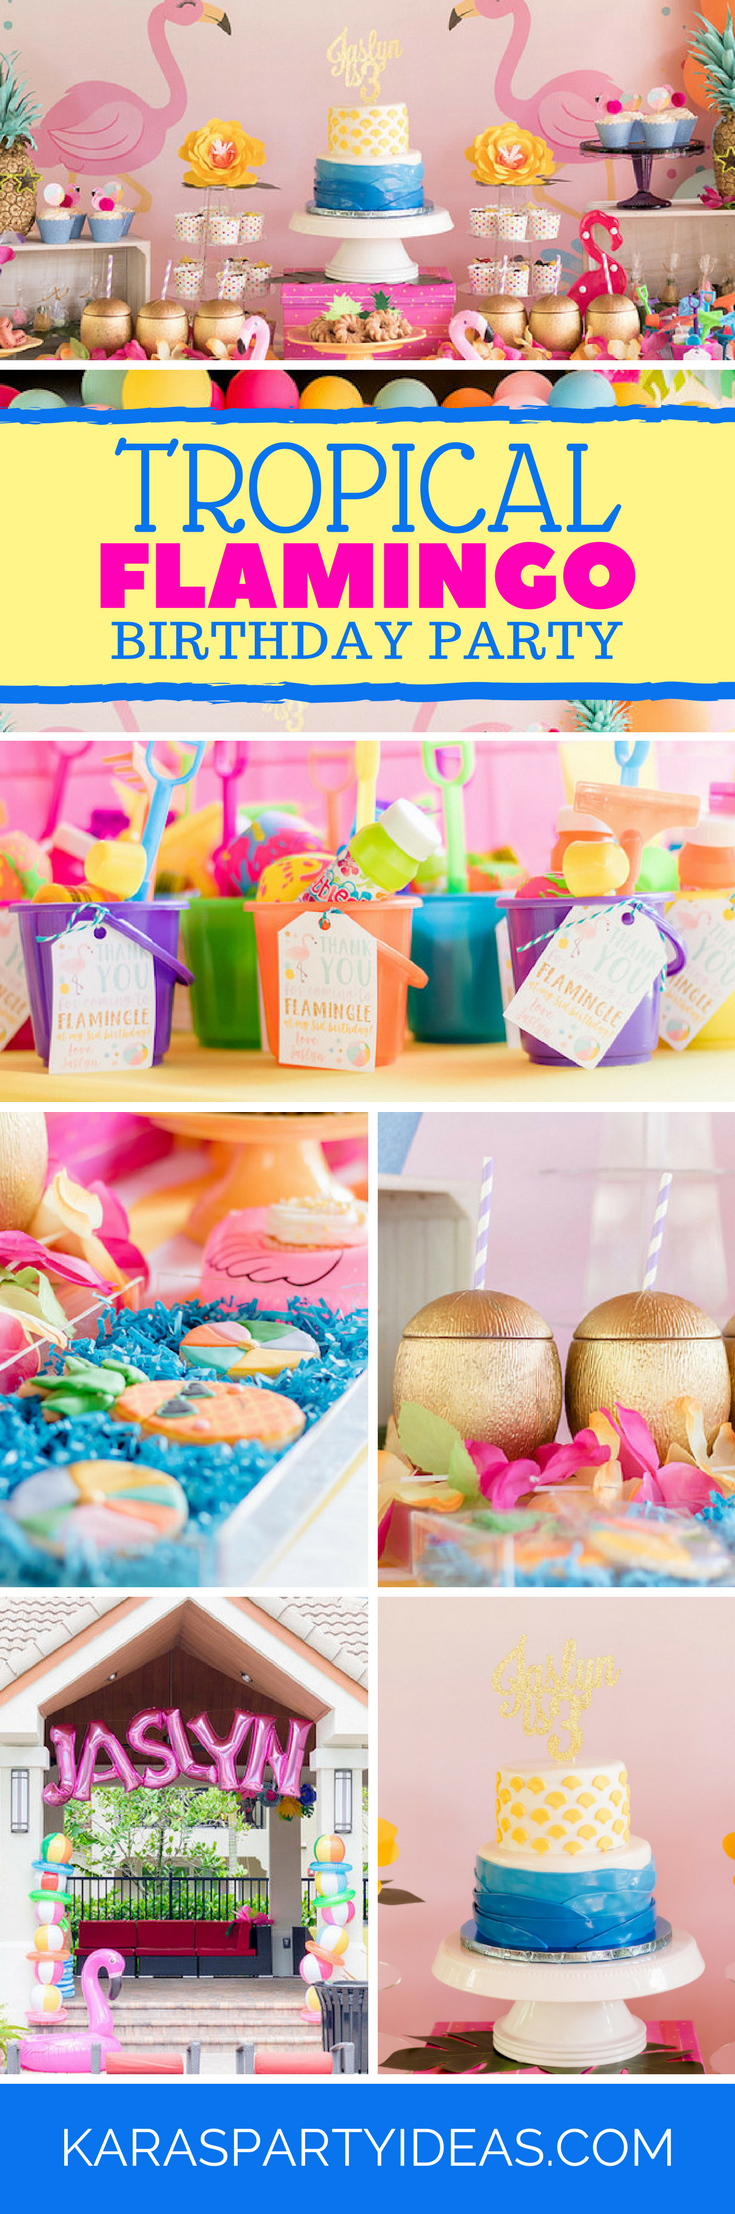 Tea time tea birthday party via kara s party ideas karaspartyideas com - Tropical Flamingo Birthday Party Via Kara S Party Ideas Karaspartyideas Com